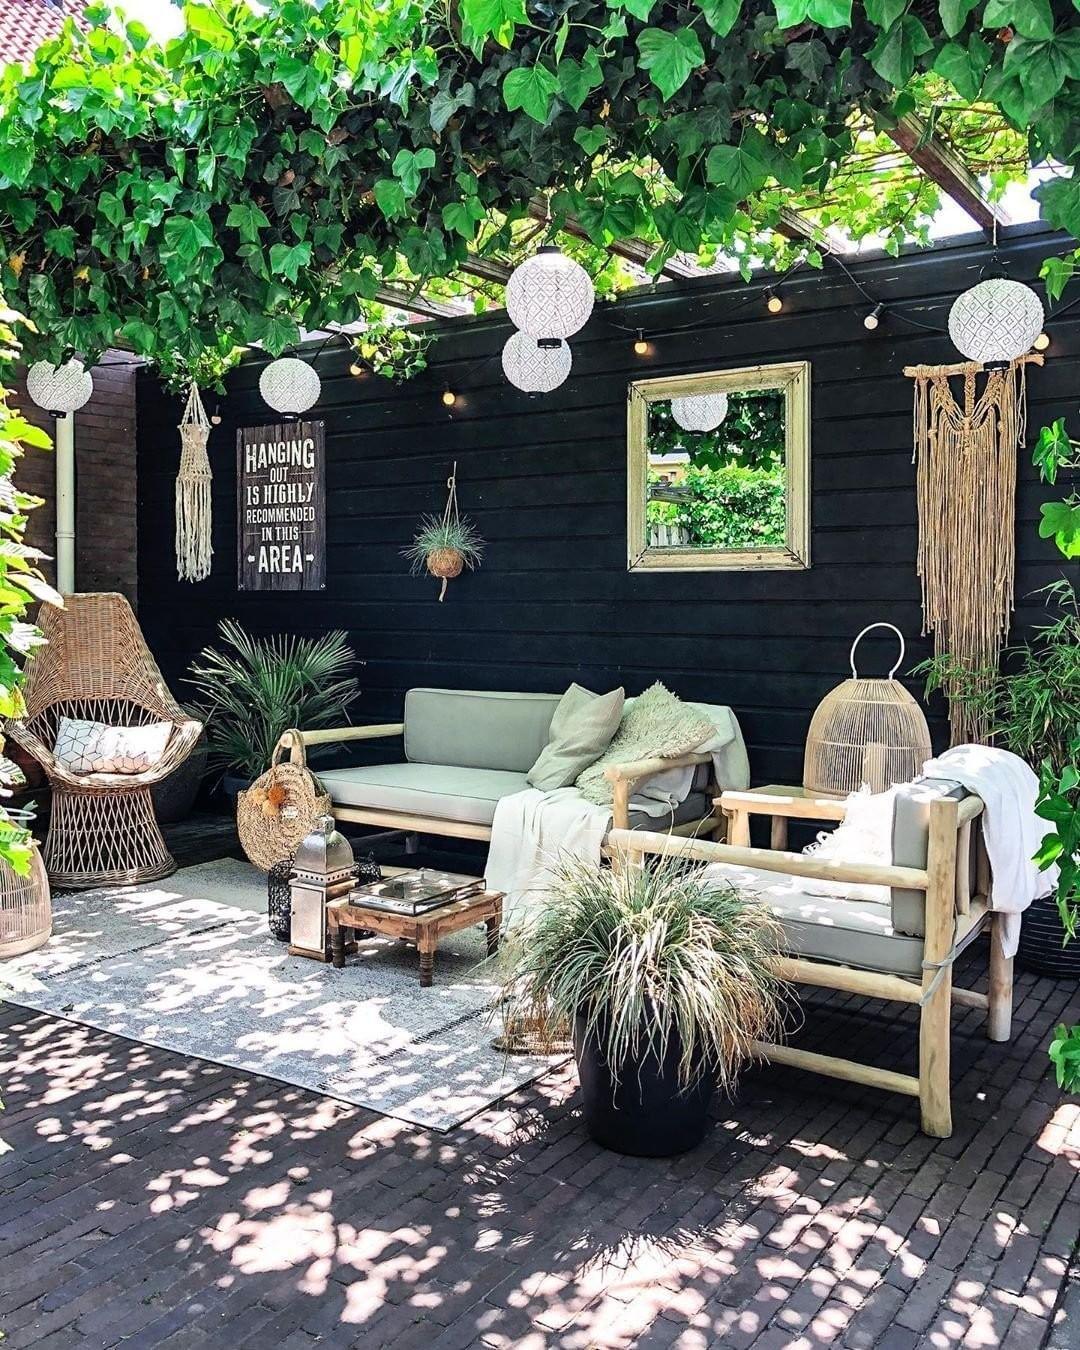 Modern Stunning Decor For Your Porch 2019 Trend Home Decor Awesome Ideas Of Porch Decor Porch Decorat Outdoor Patio Designs Backyard Decor Patio Inspiration